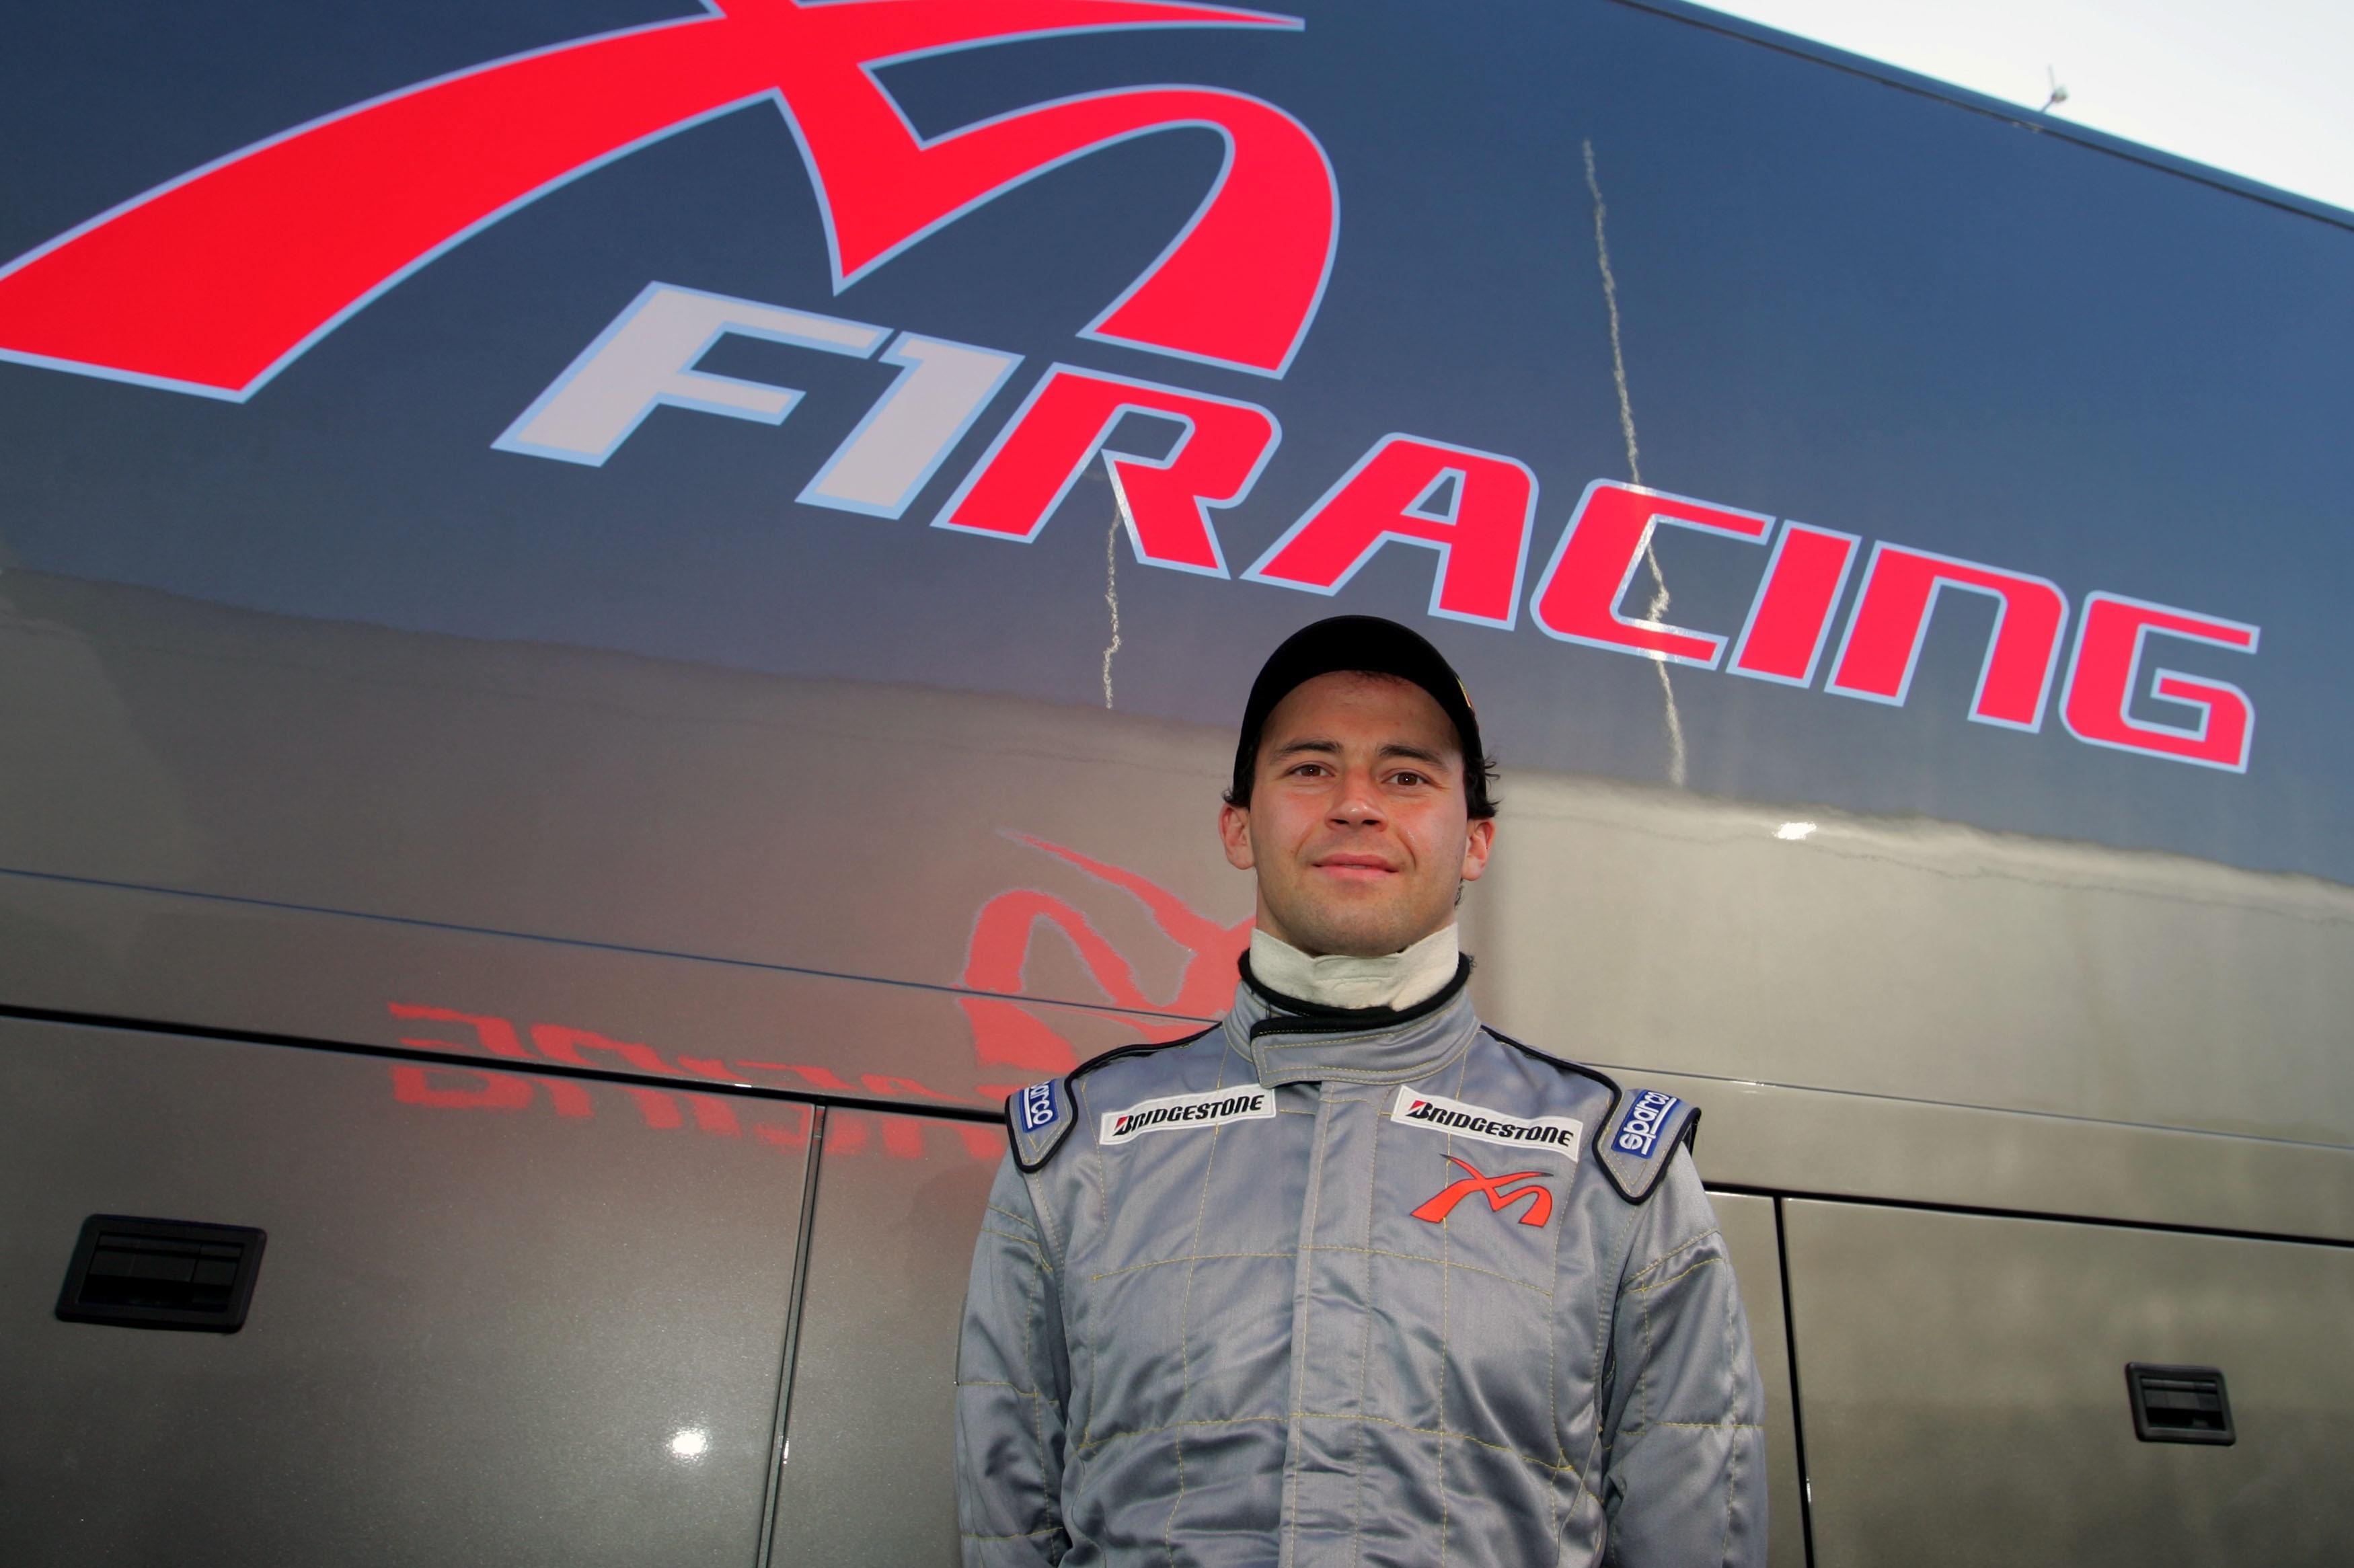 Thomas Biagi, 2005 Midland F1 test